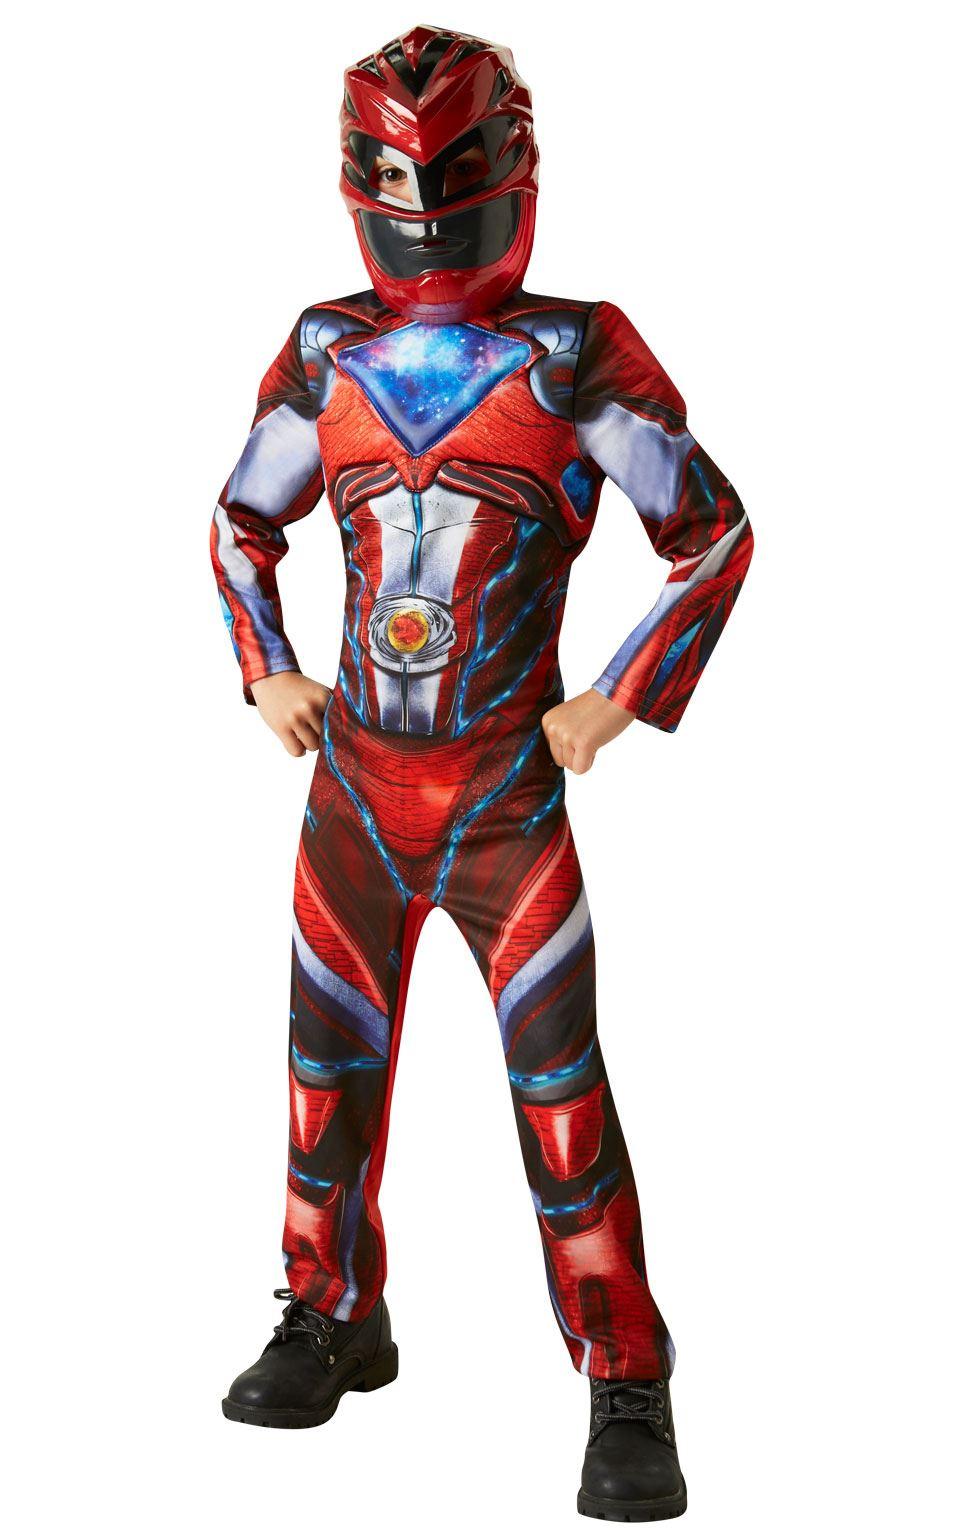 Ninos-De-Lujo-Power-Rangers-Pelicula-Rojo-Ranger-Disfraz-Nino-Disfraz